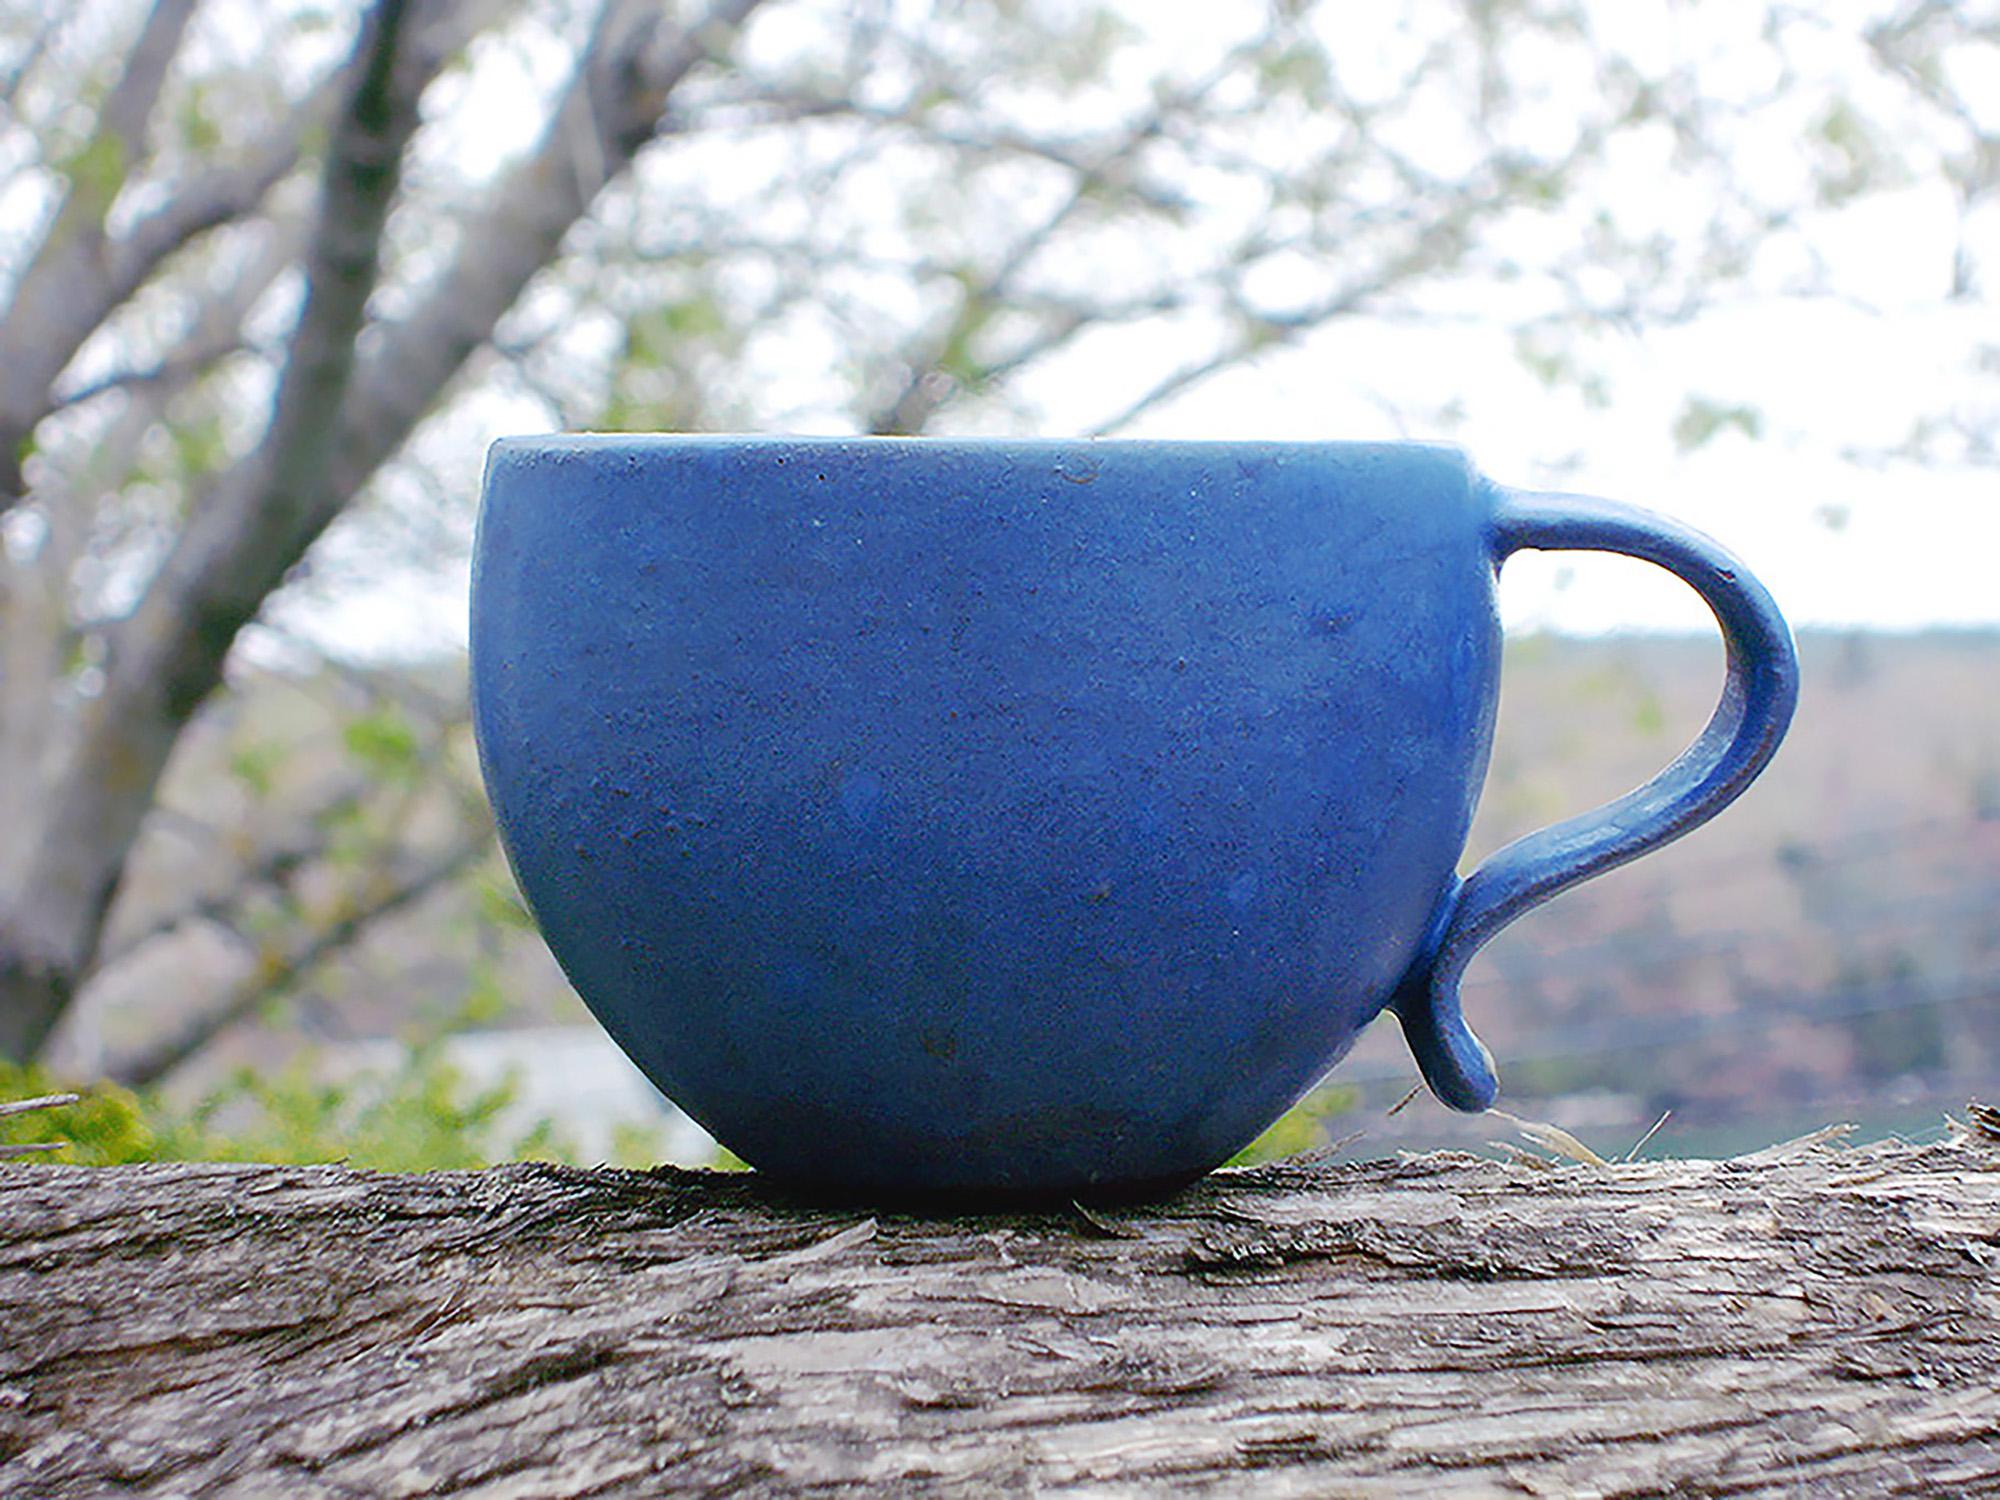 Tea Cup in Blueberry Glaze